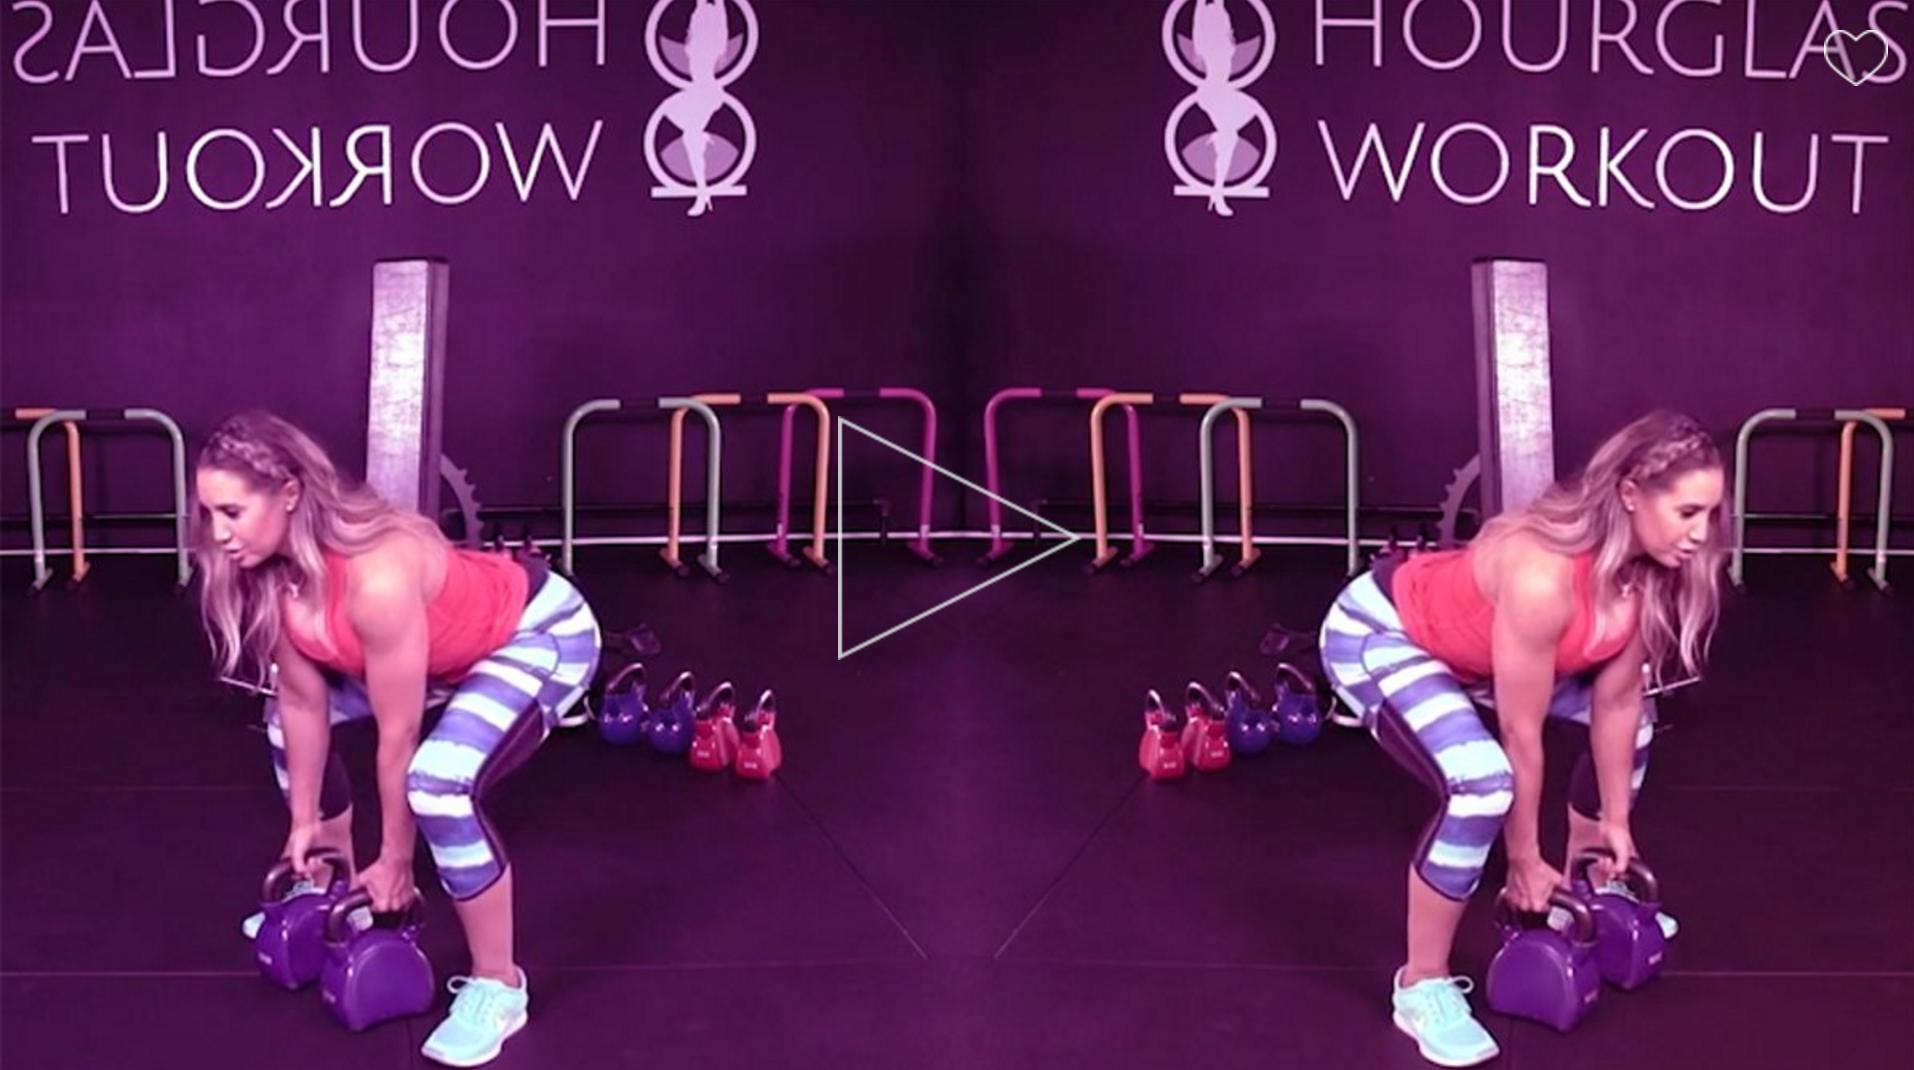 Hourglass Body Workout